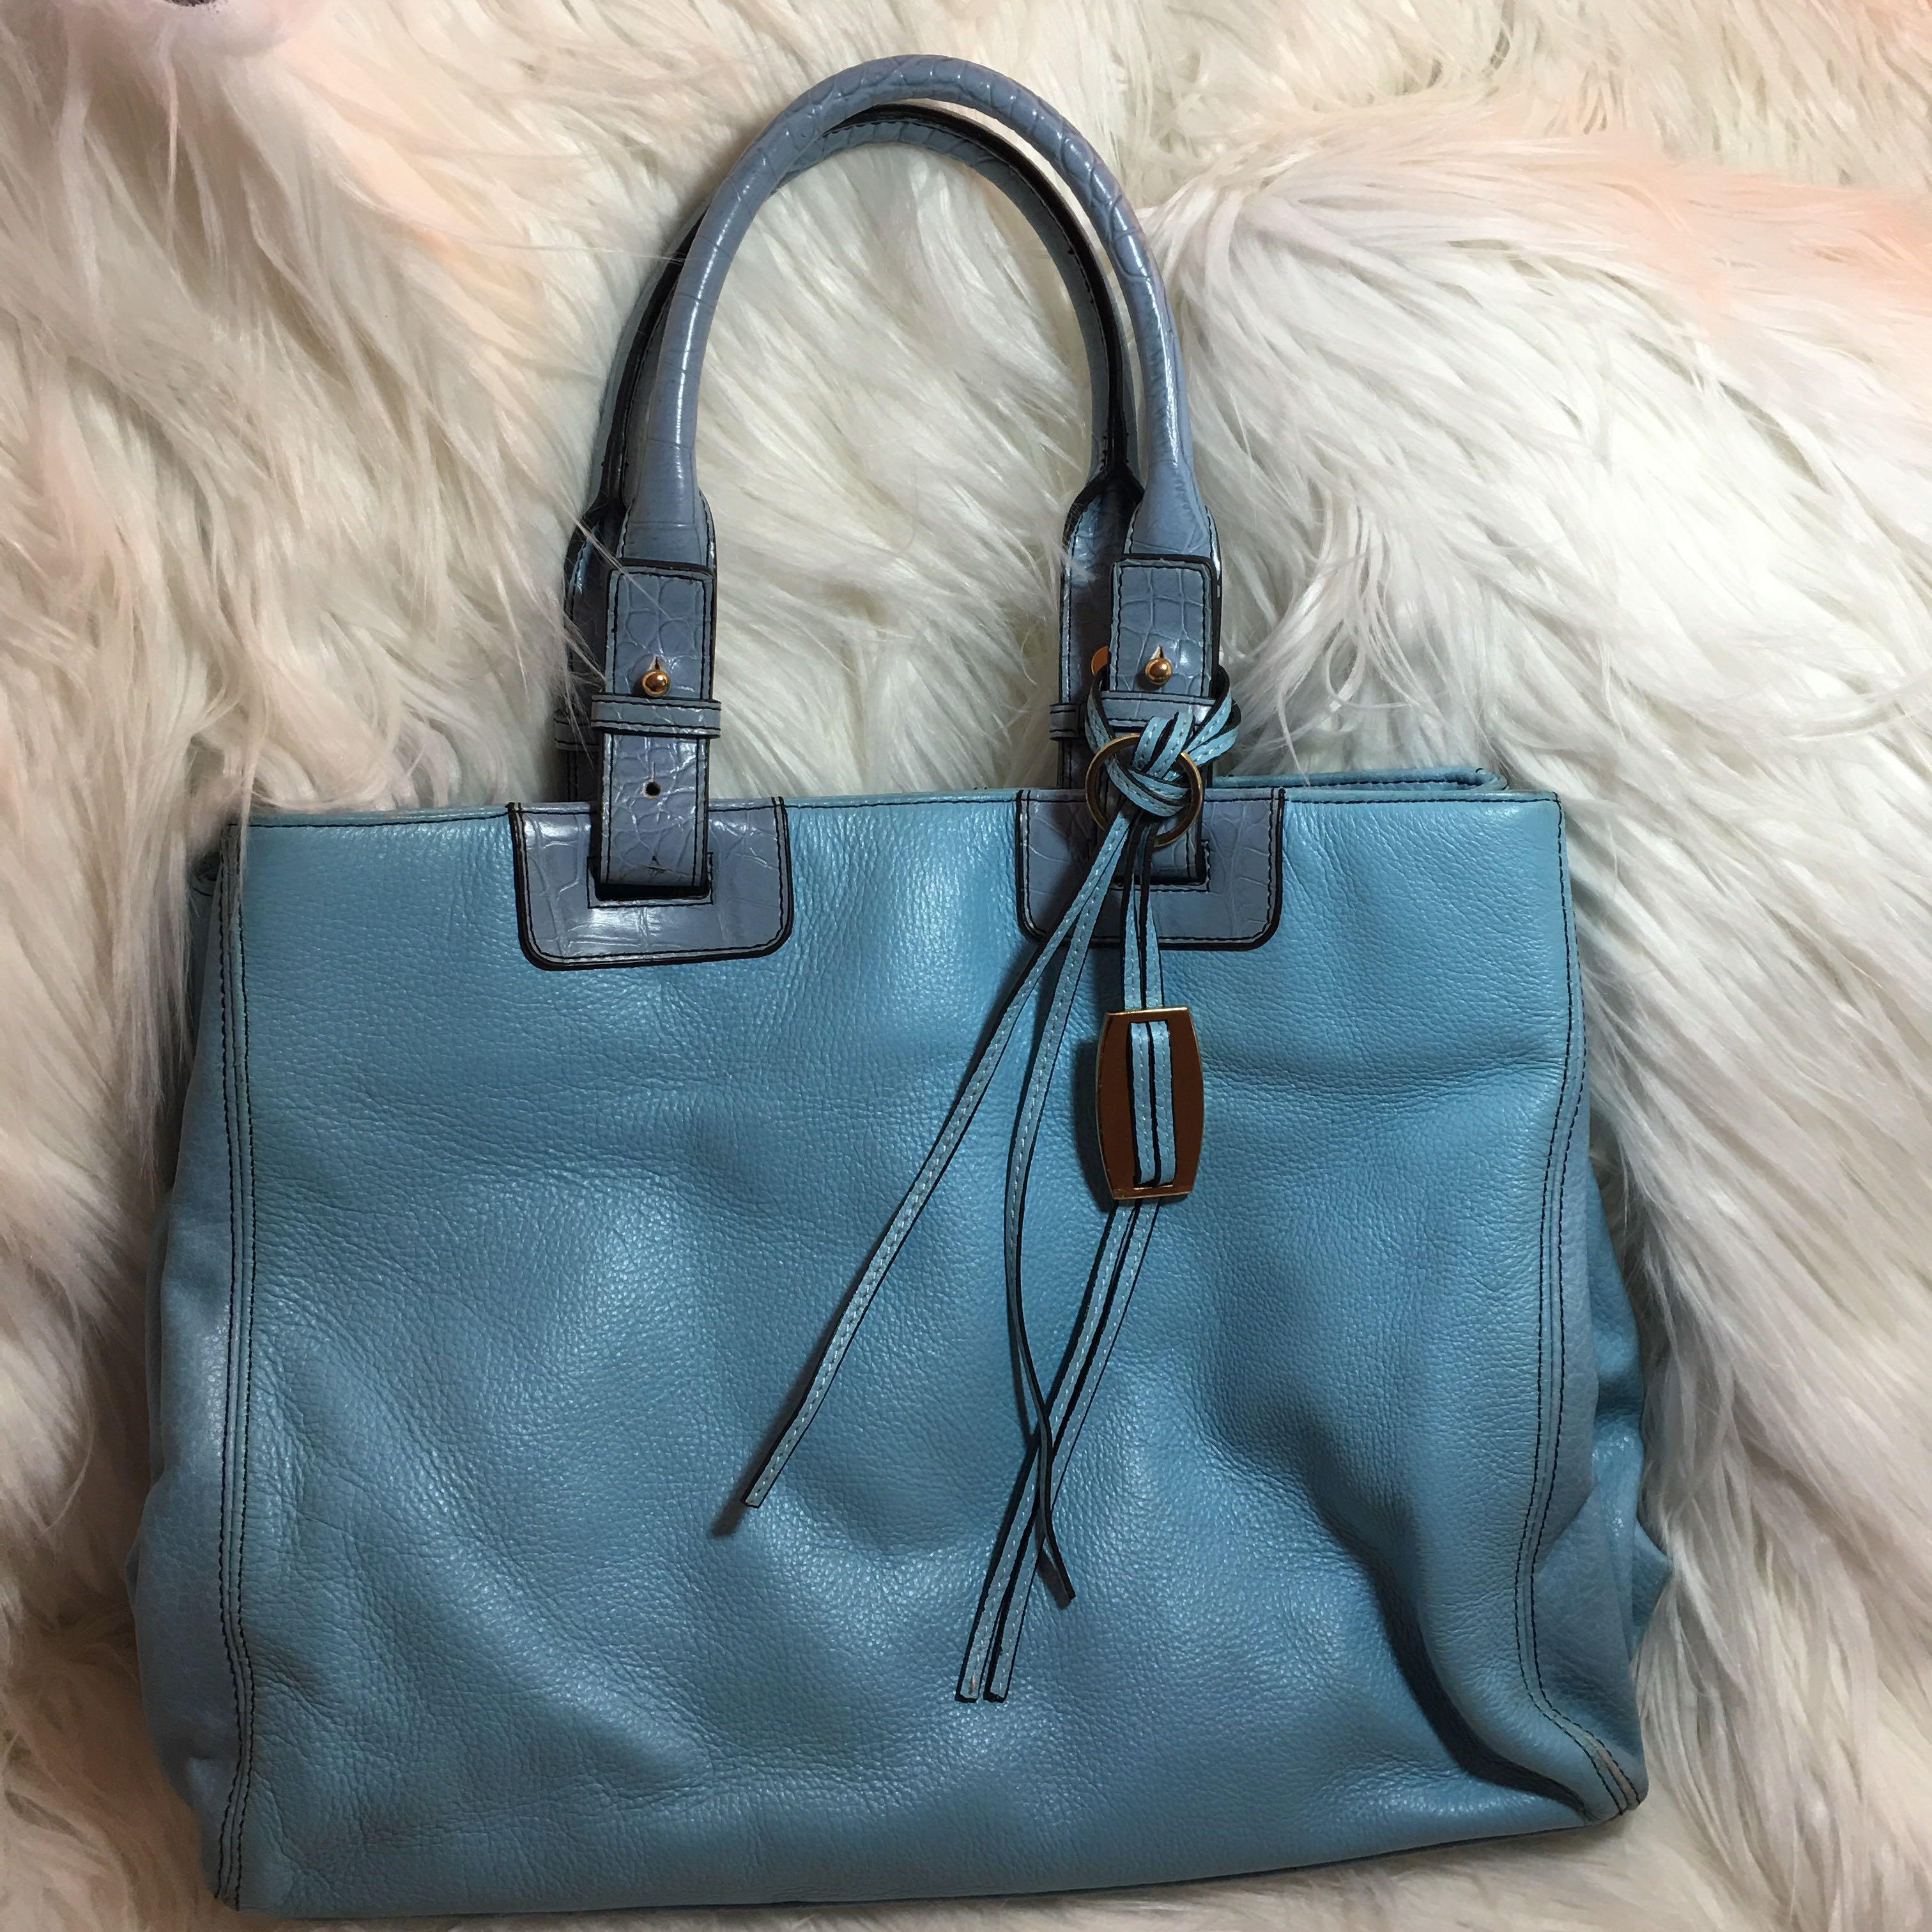 J. Ferry Handbag